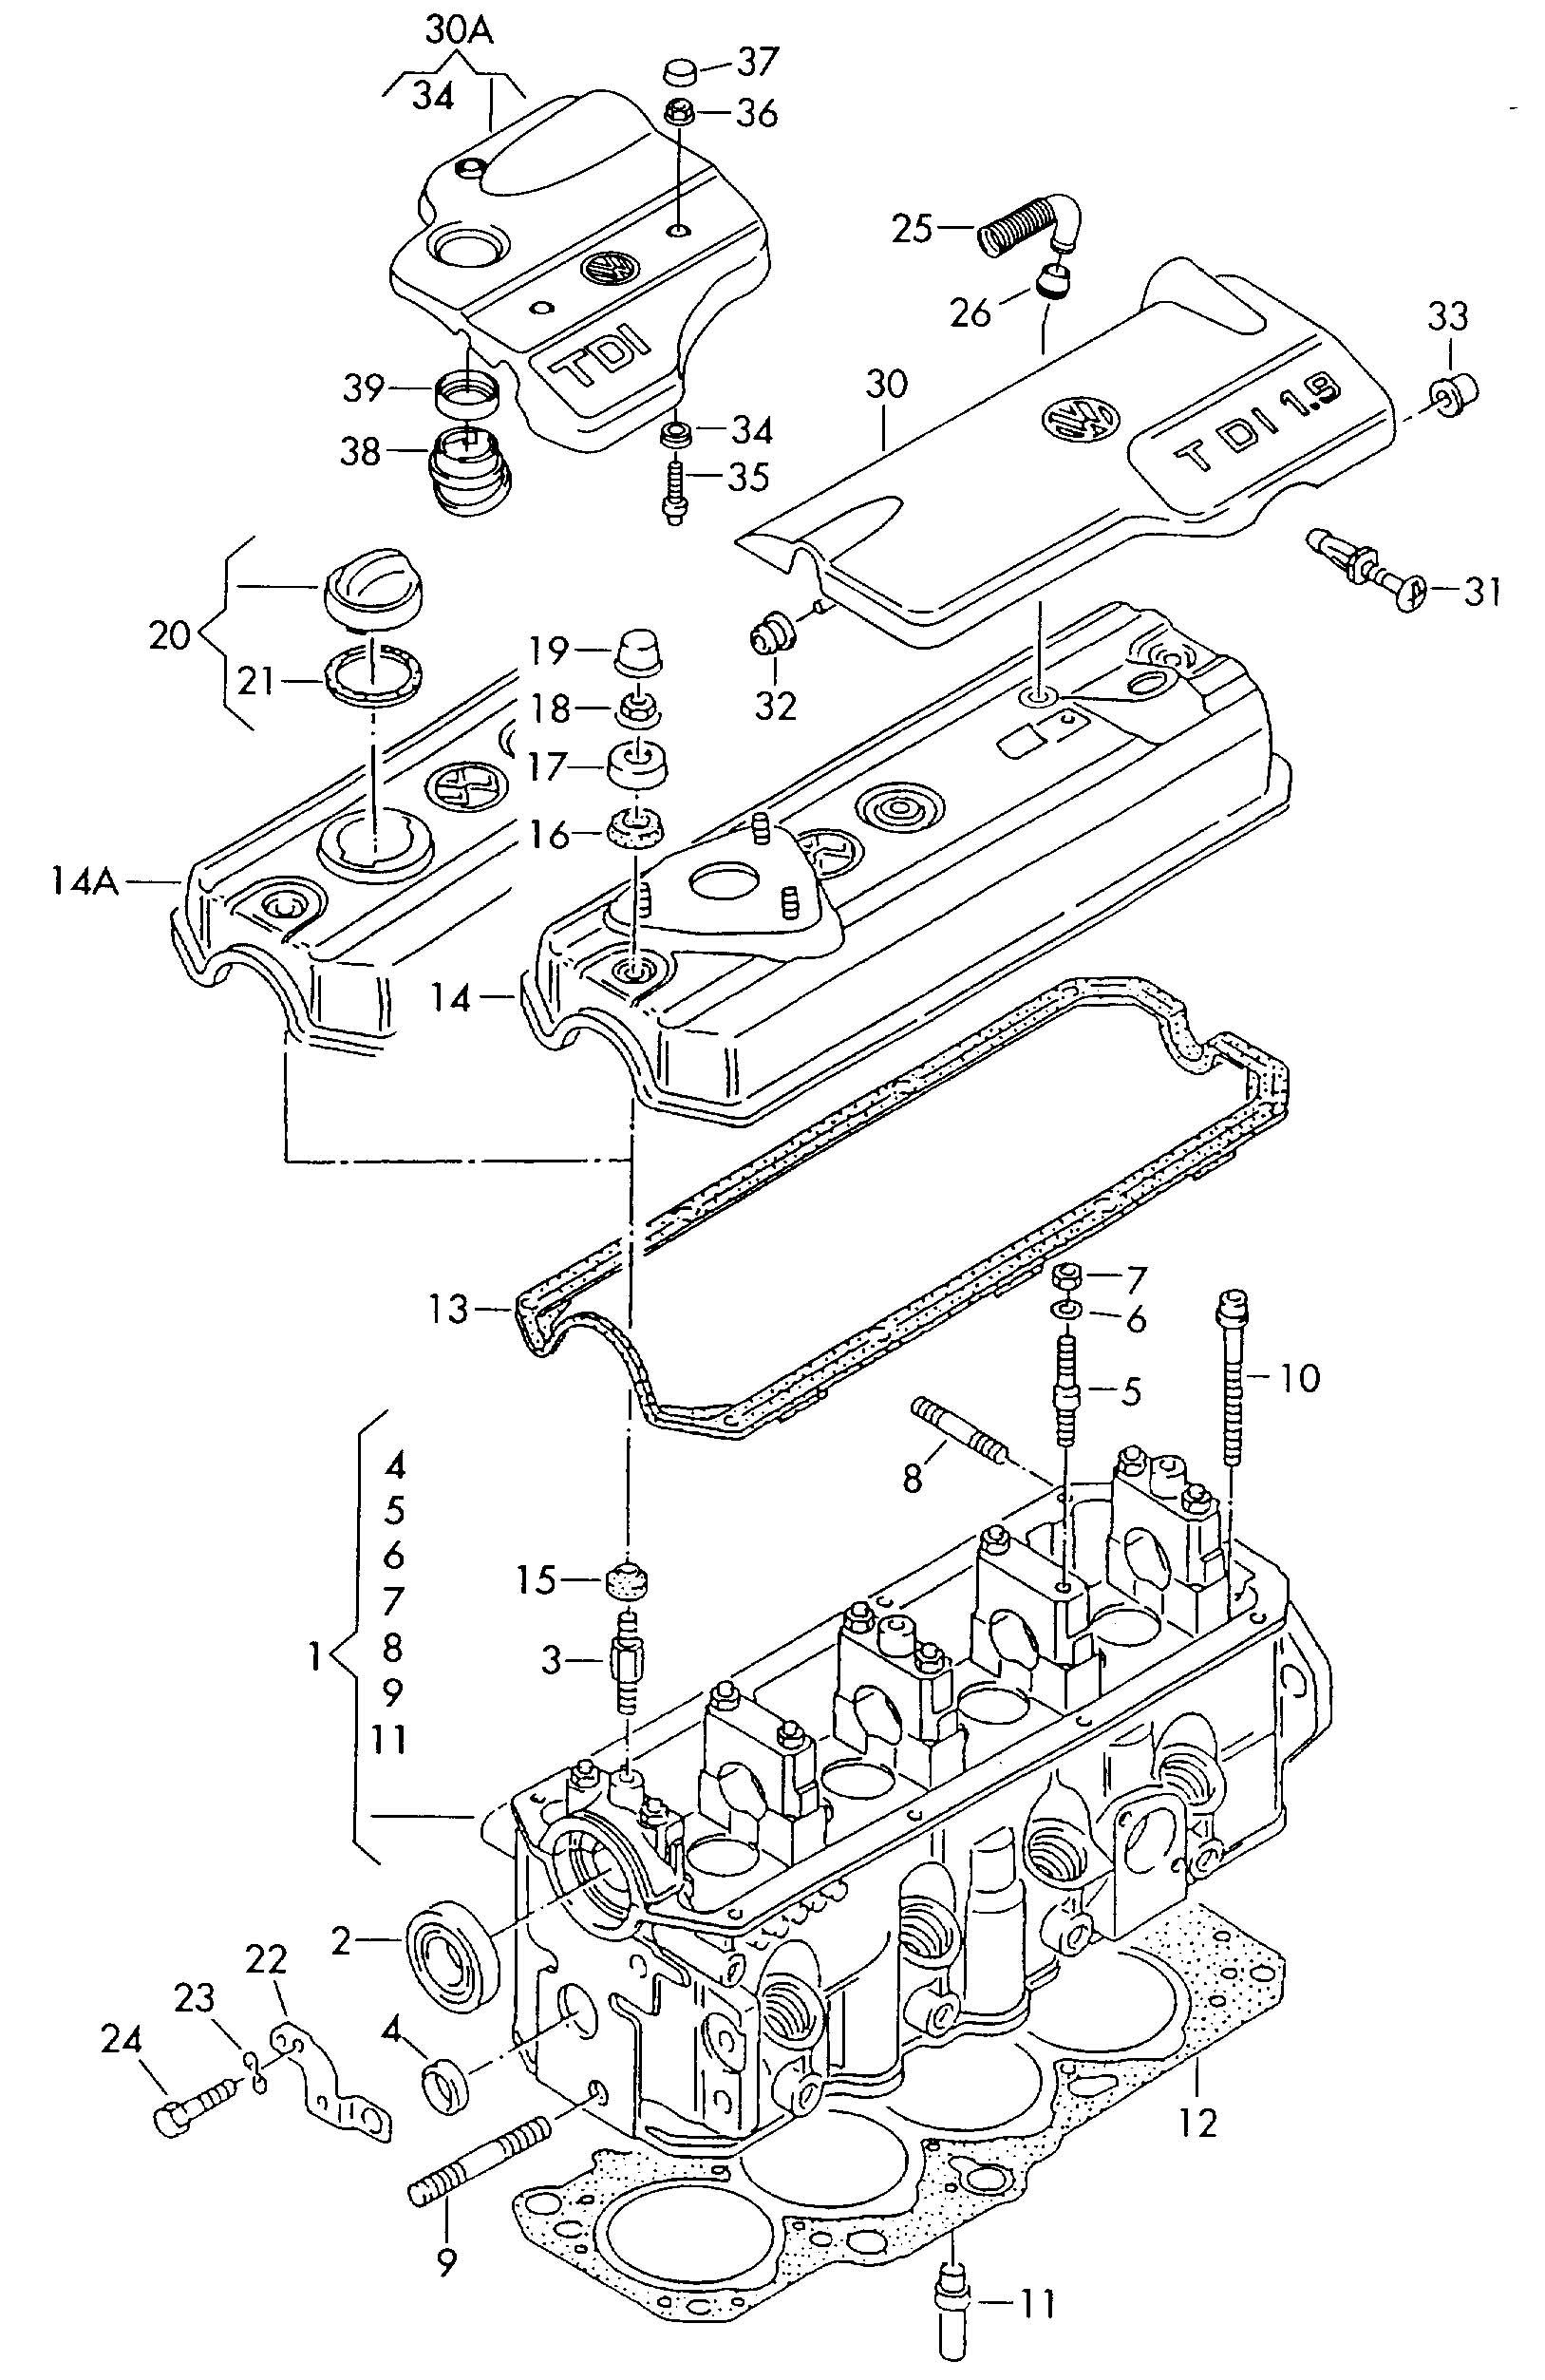 hight resolution of wrg 6760 vw 1 8t engine parts diagram 96 jetta engine diagram get free image